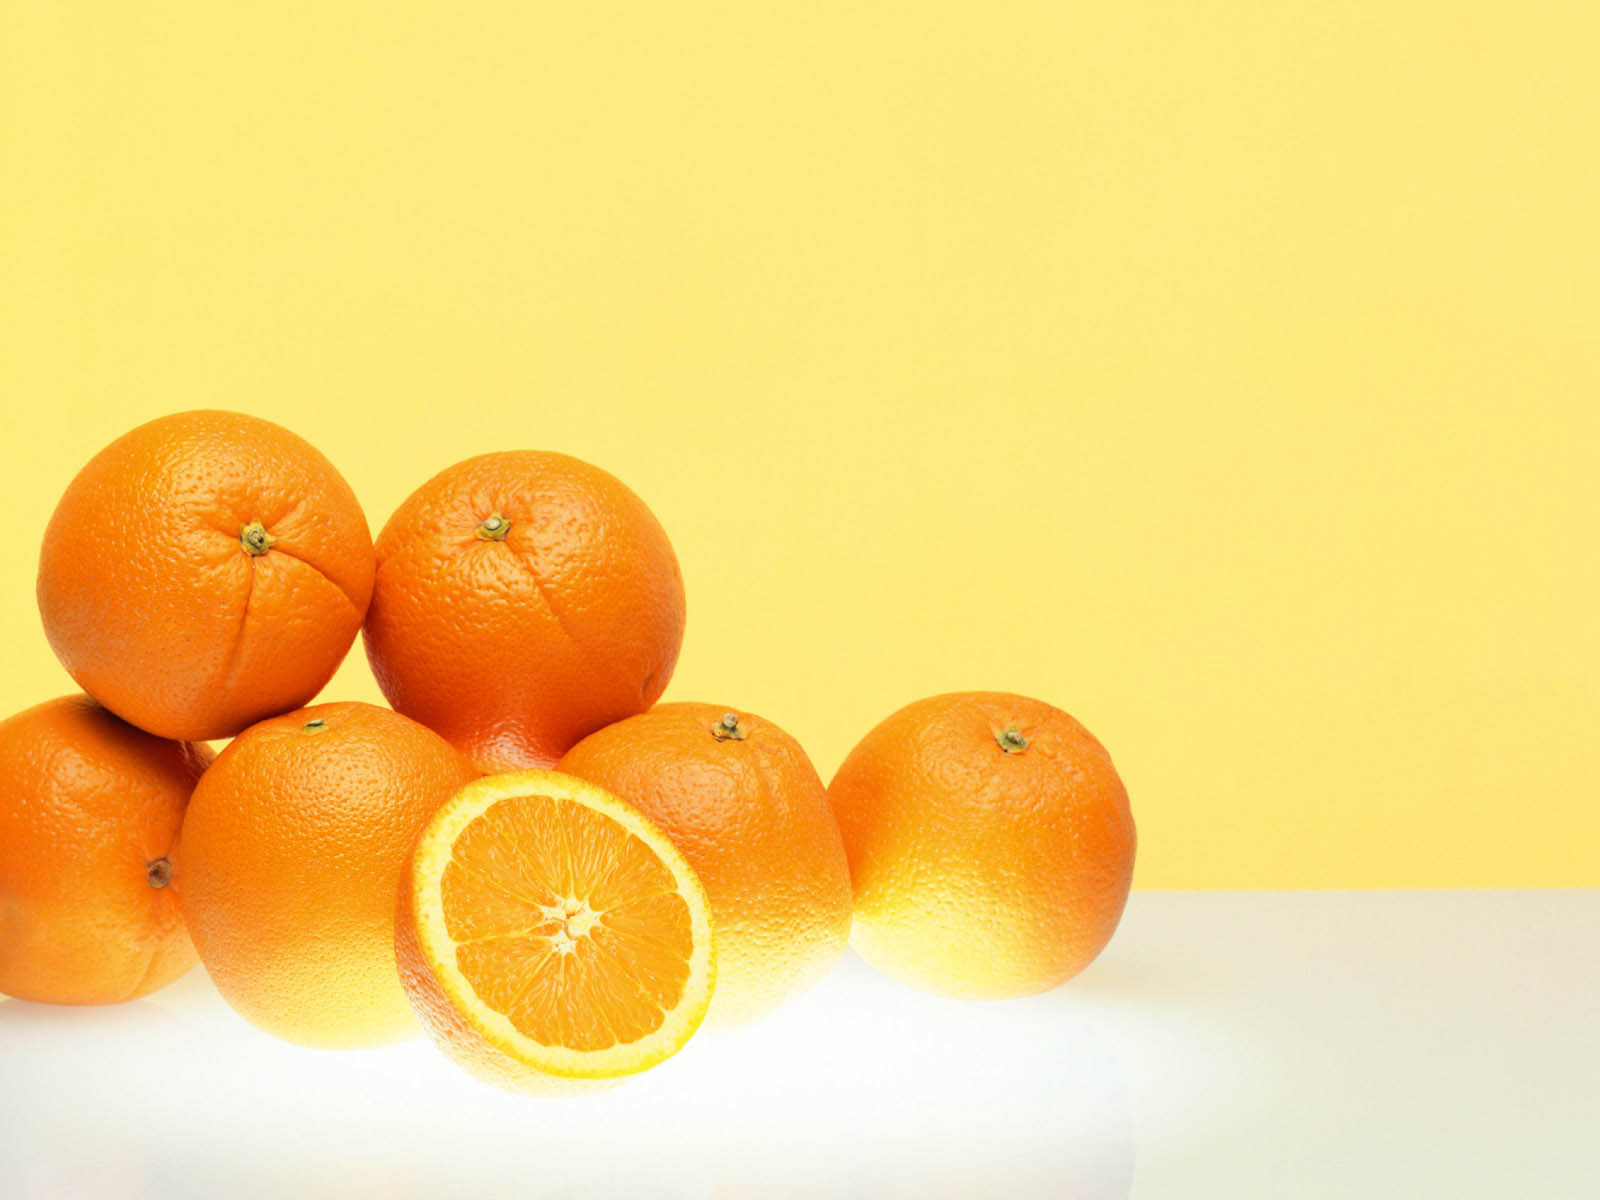 wallpaper: Orange Fruits Wallpapers